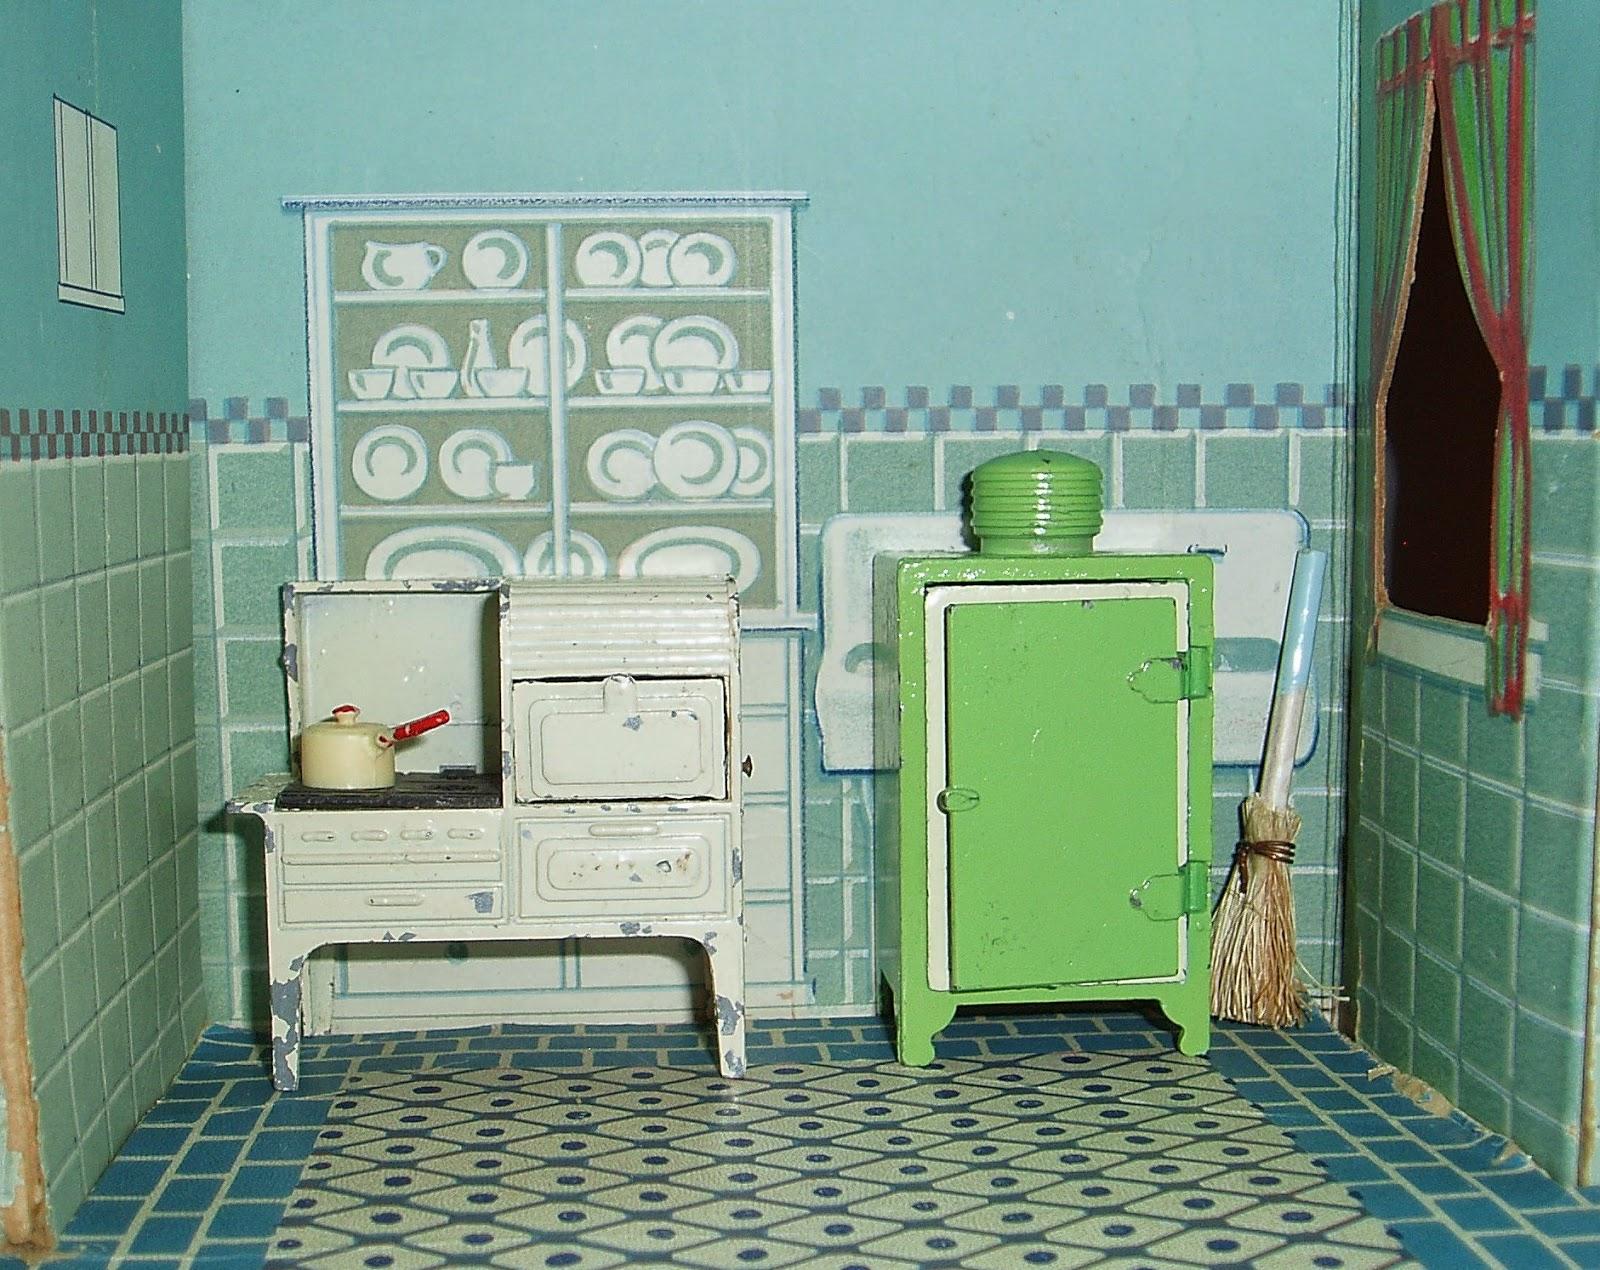 kitchen jpg kitchen kitchen sinks alcove arched apron kitchen sink kitchen sinks alcove